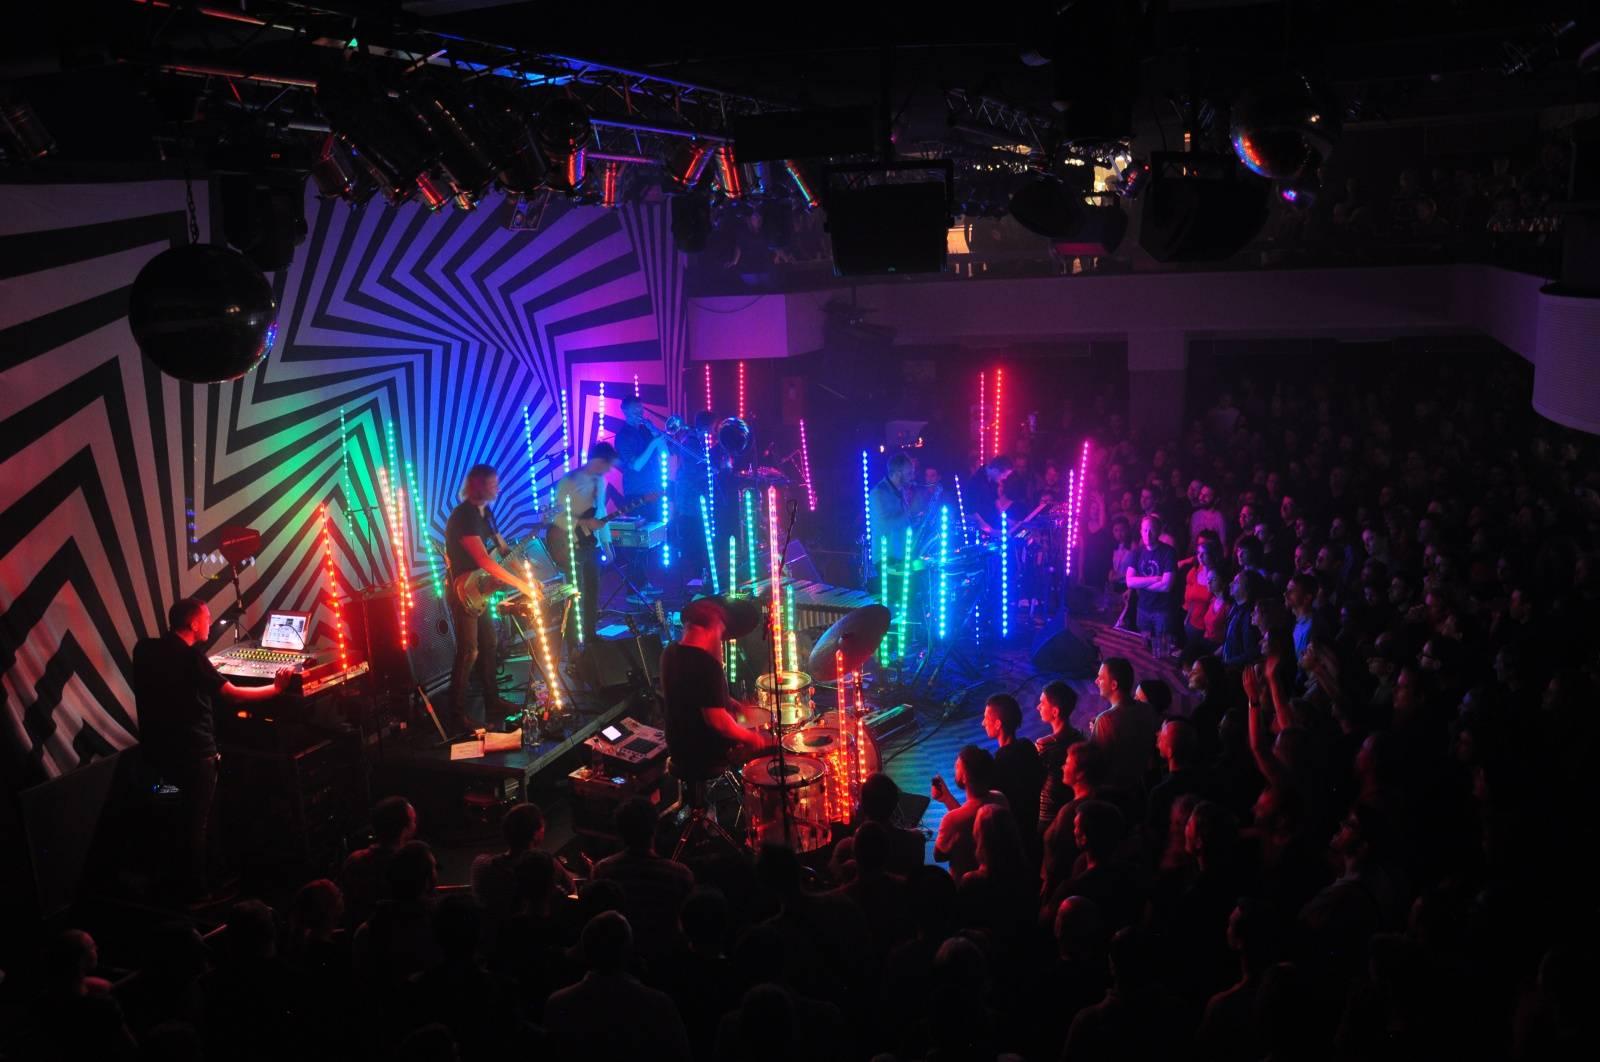 LIVE: Jaga Jazzist rozsvítili pražský Lucerna Music Bar